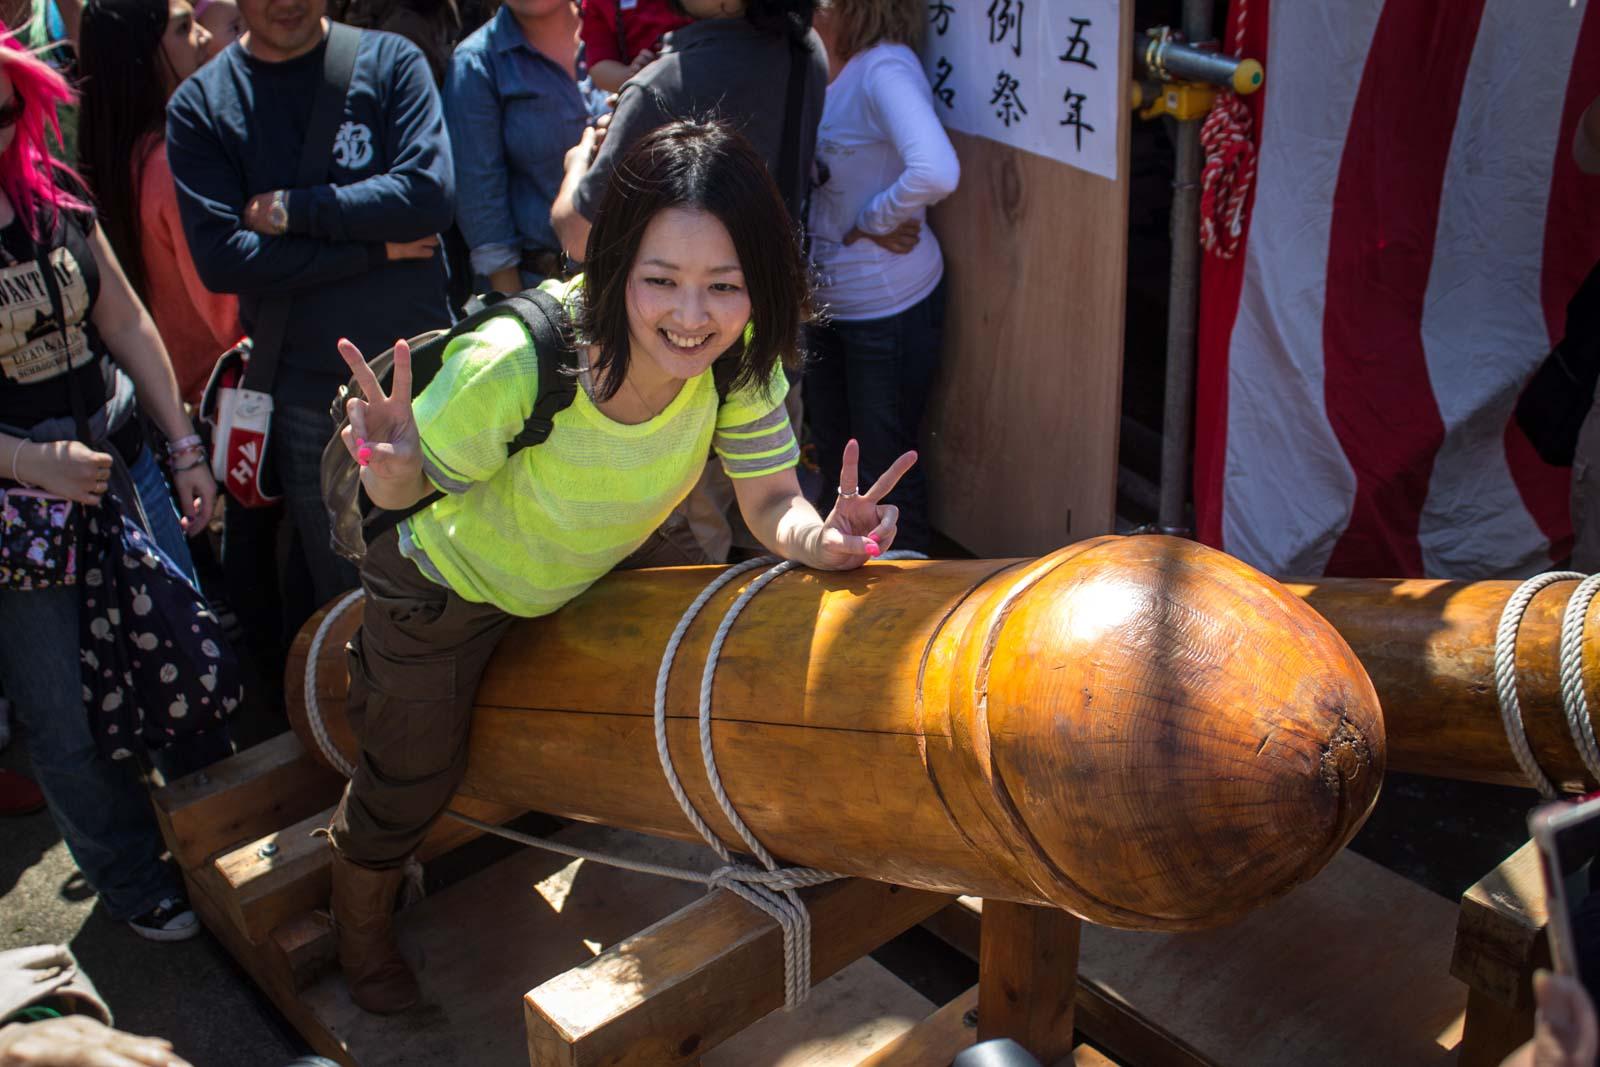 Penis festival, kawasaki, japan, kanamara matsuri, weird festivals